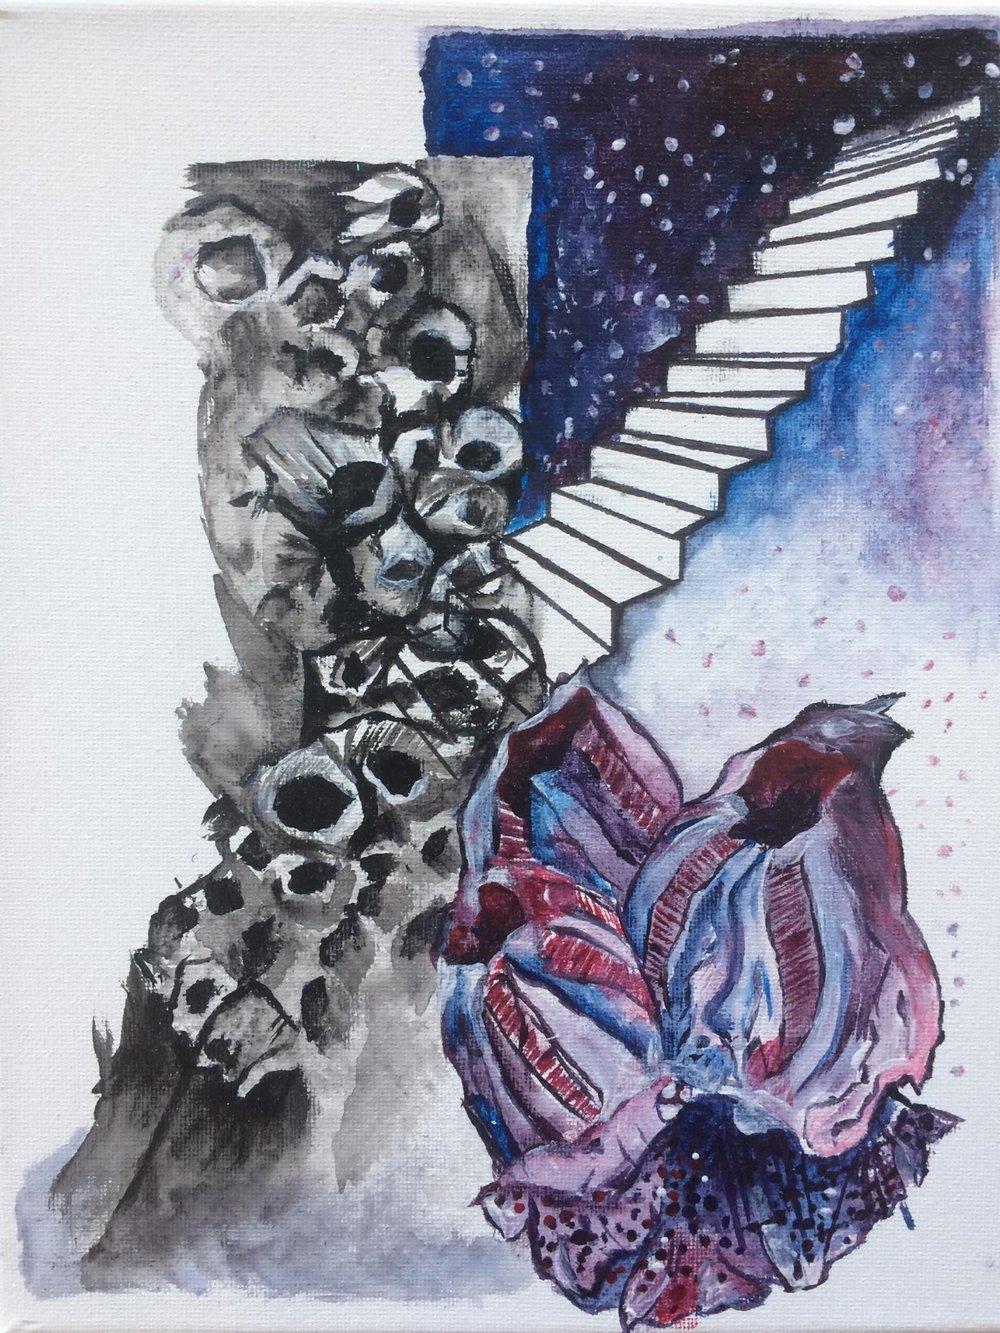 Artwork by Sara Farag Elkamel.